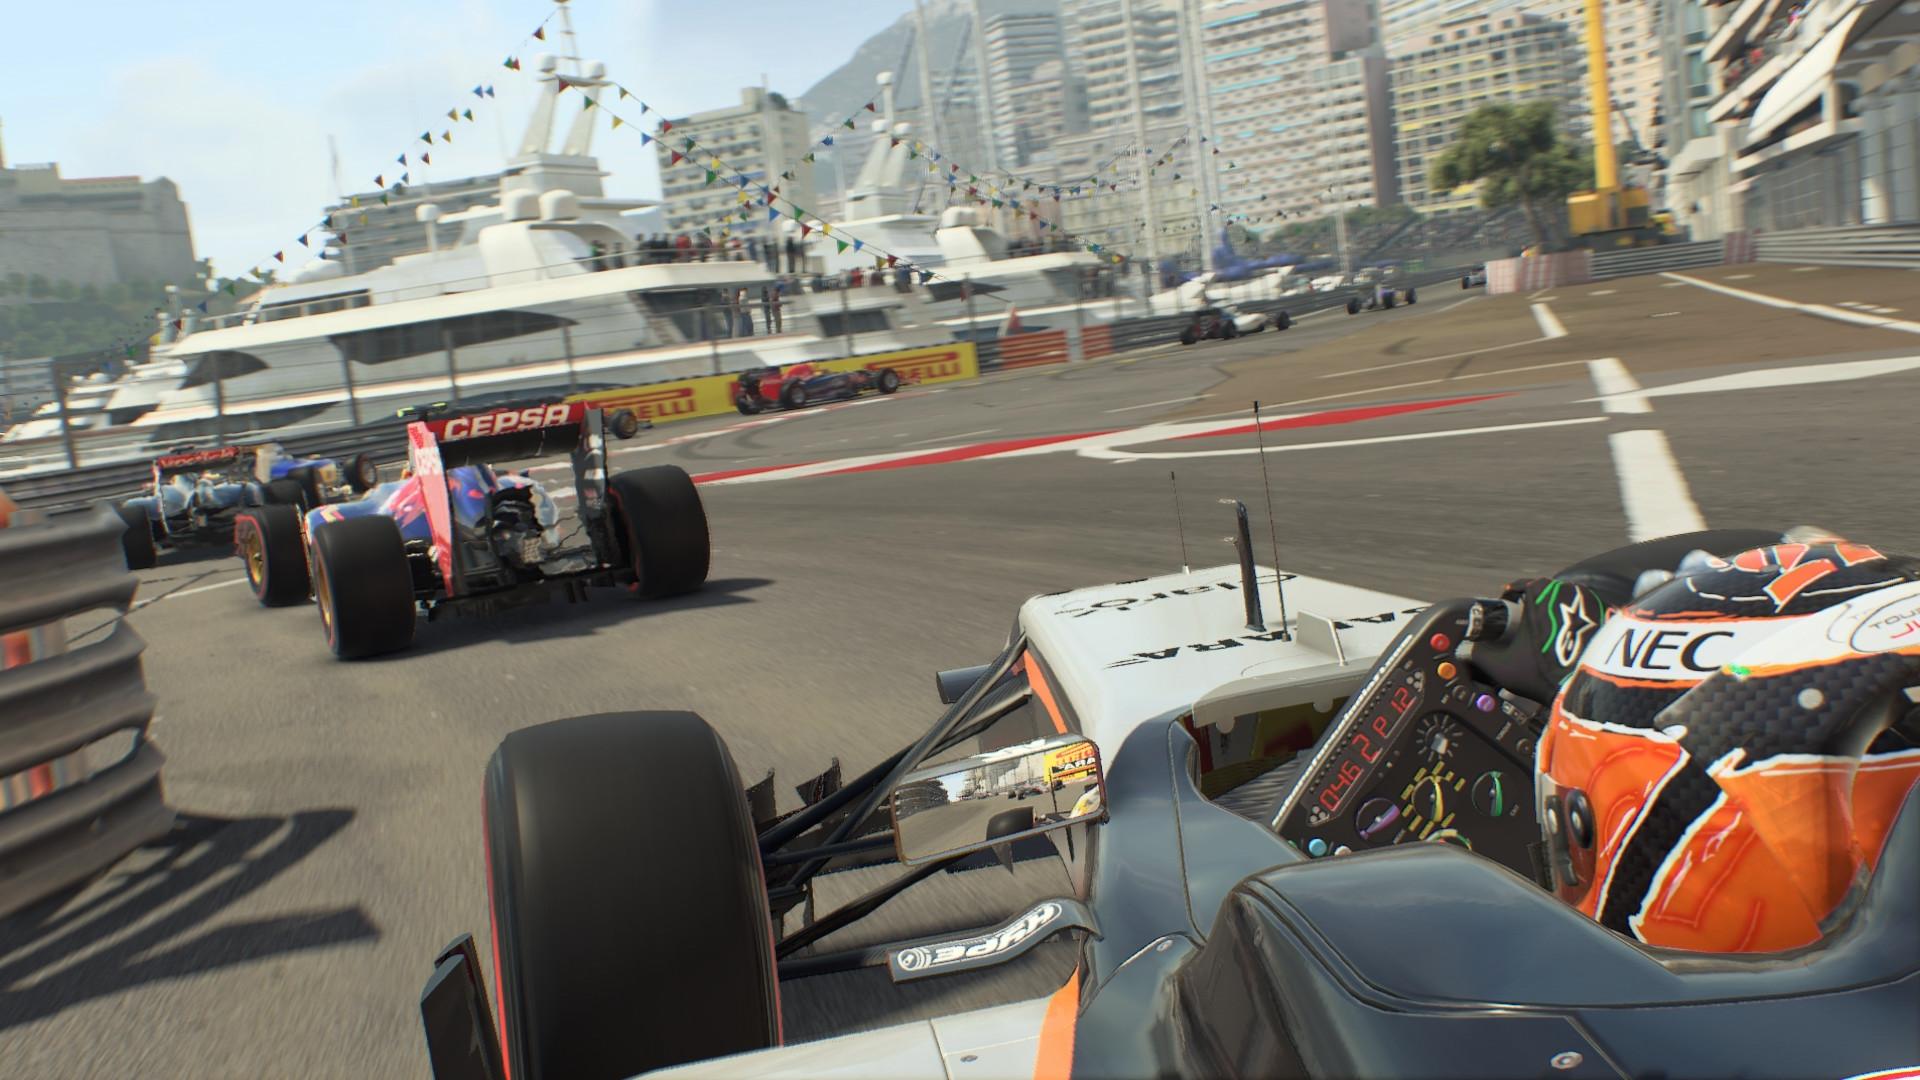 F1 2015 ESPAÑOL PC Full (CPY) + UPDATE v1.0.19.5154 + REPACK 2 DVD5 (JPW) 4